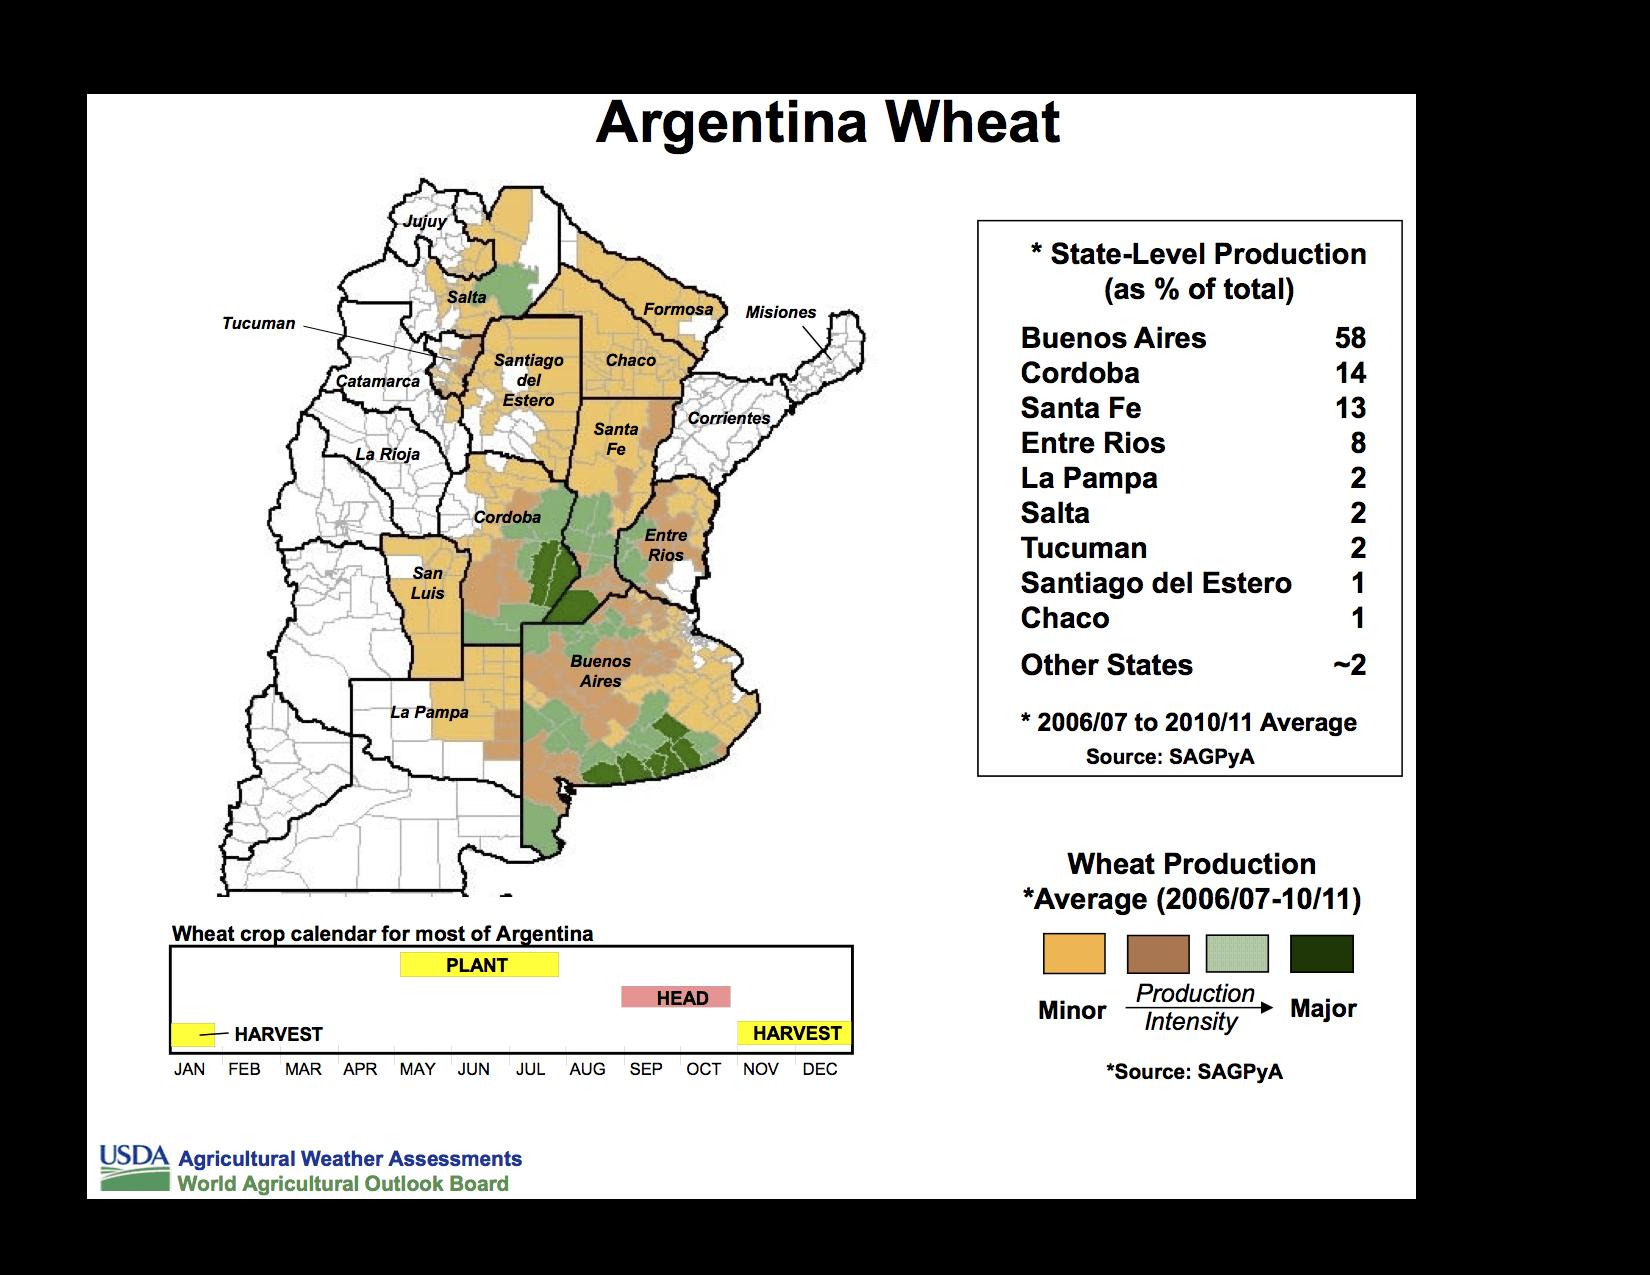 Argentina Wheat